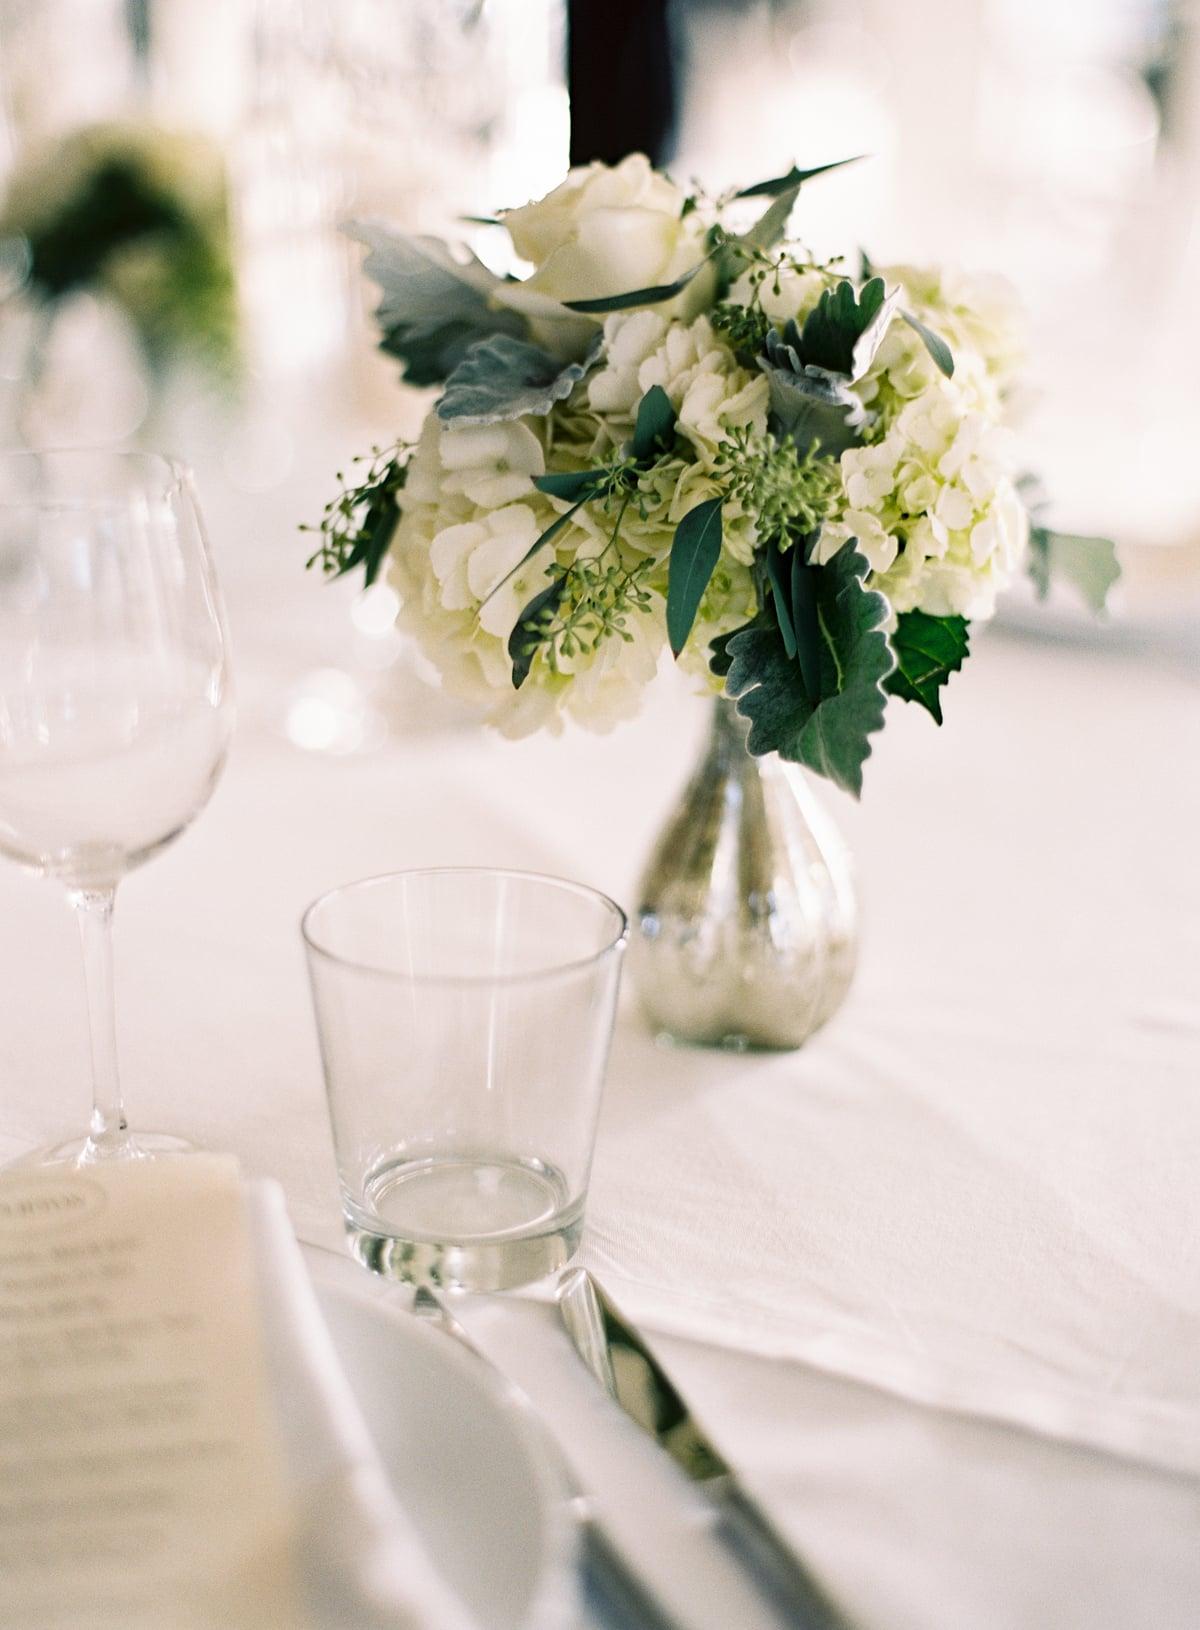 clifton-inn-wedding-047.jpg